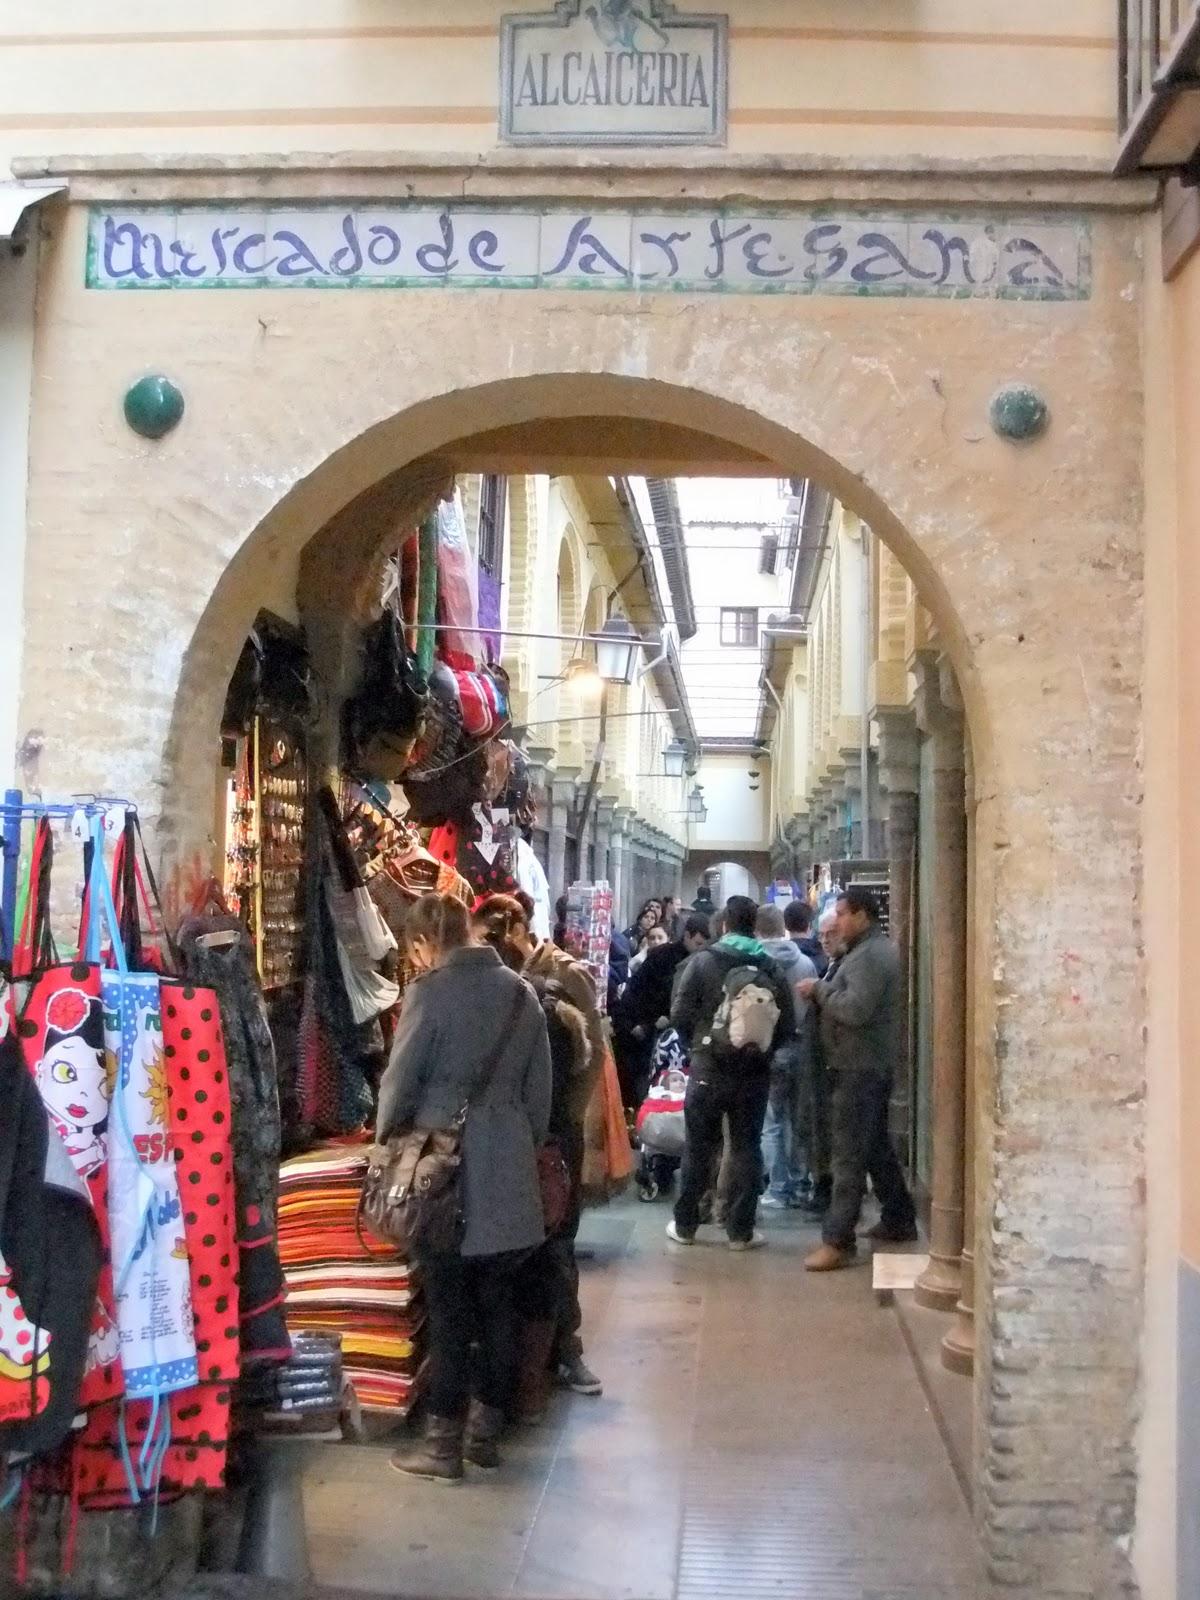 The Alcaiceria Market - Granada - Epicurean Travel